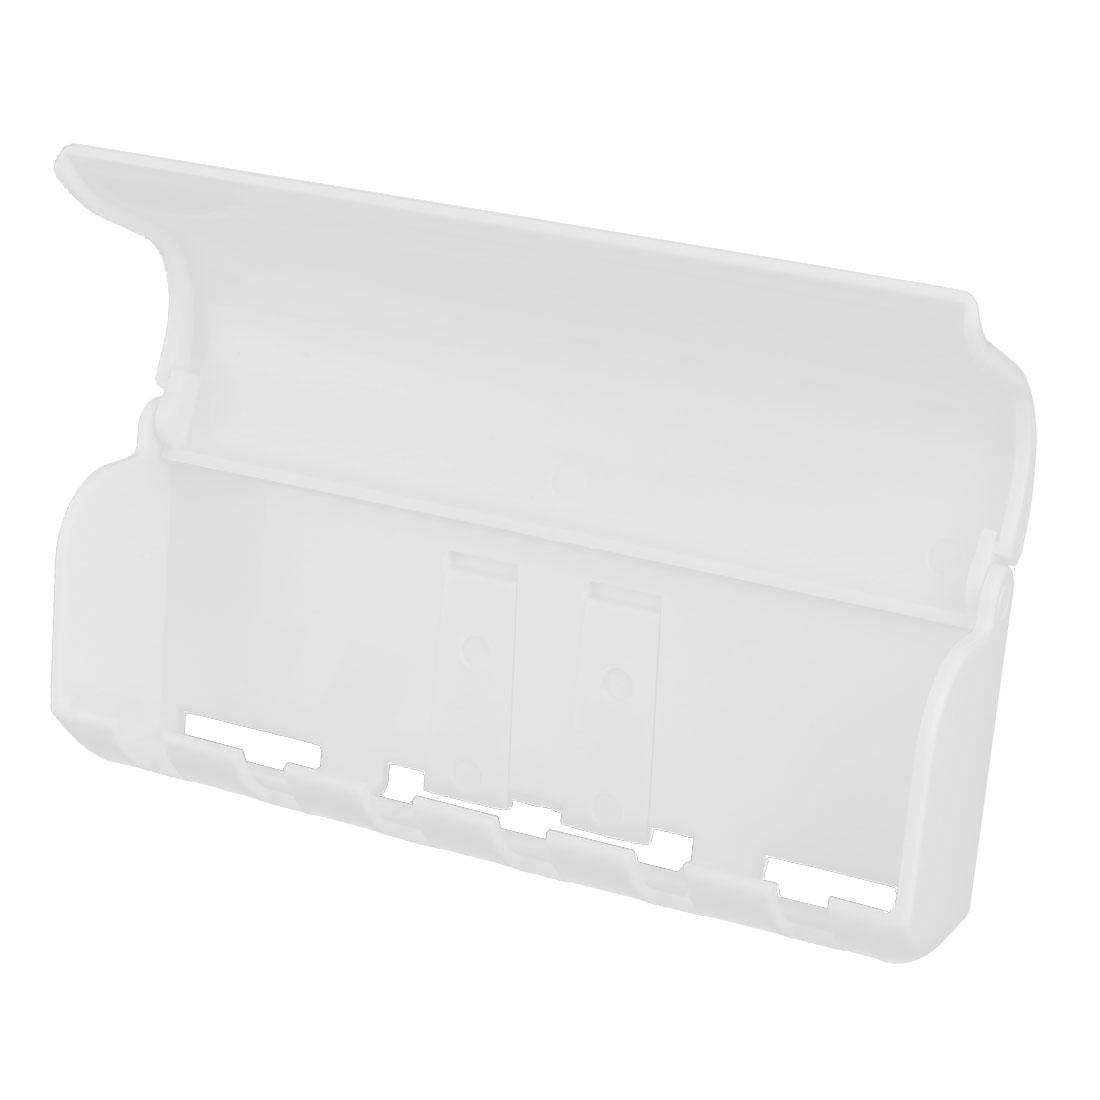 Household Plastic Wall Mount Self Adhesive 6 Racks Toothbrush Holder Storage White